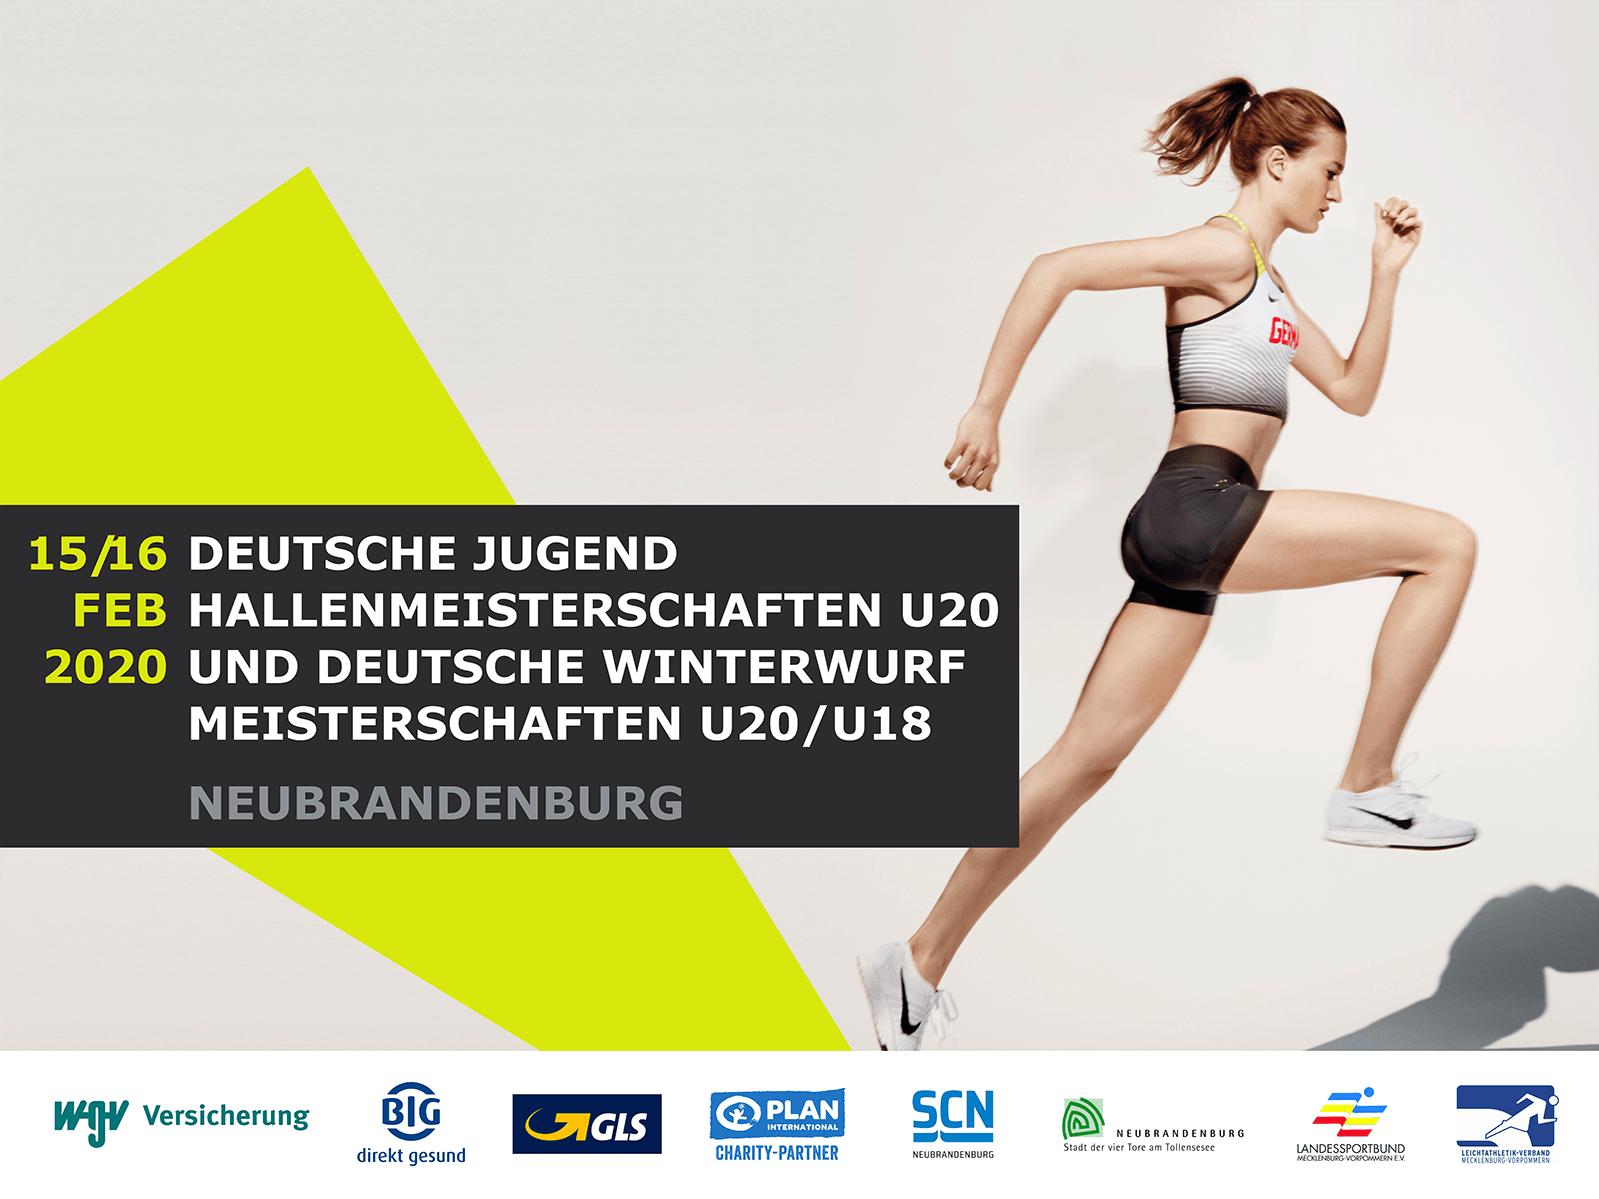 2020-02-15_DJHM - DJHM_Neubrandenburg_2020_4.3_Veranstaltungsgrafik-1600x1200-1